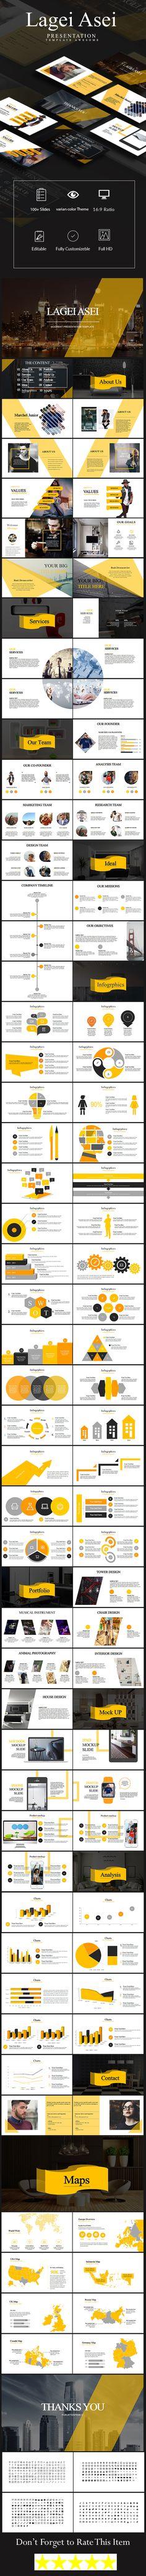 Lagei Asei PowerPoint Presentation Template